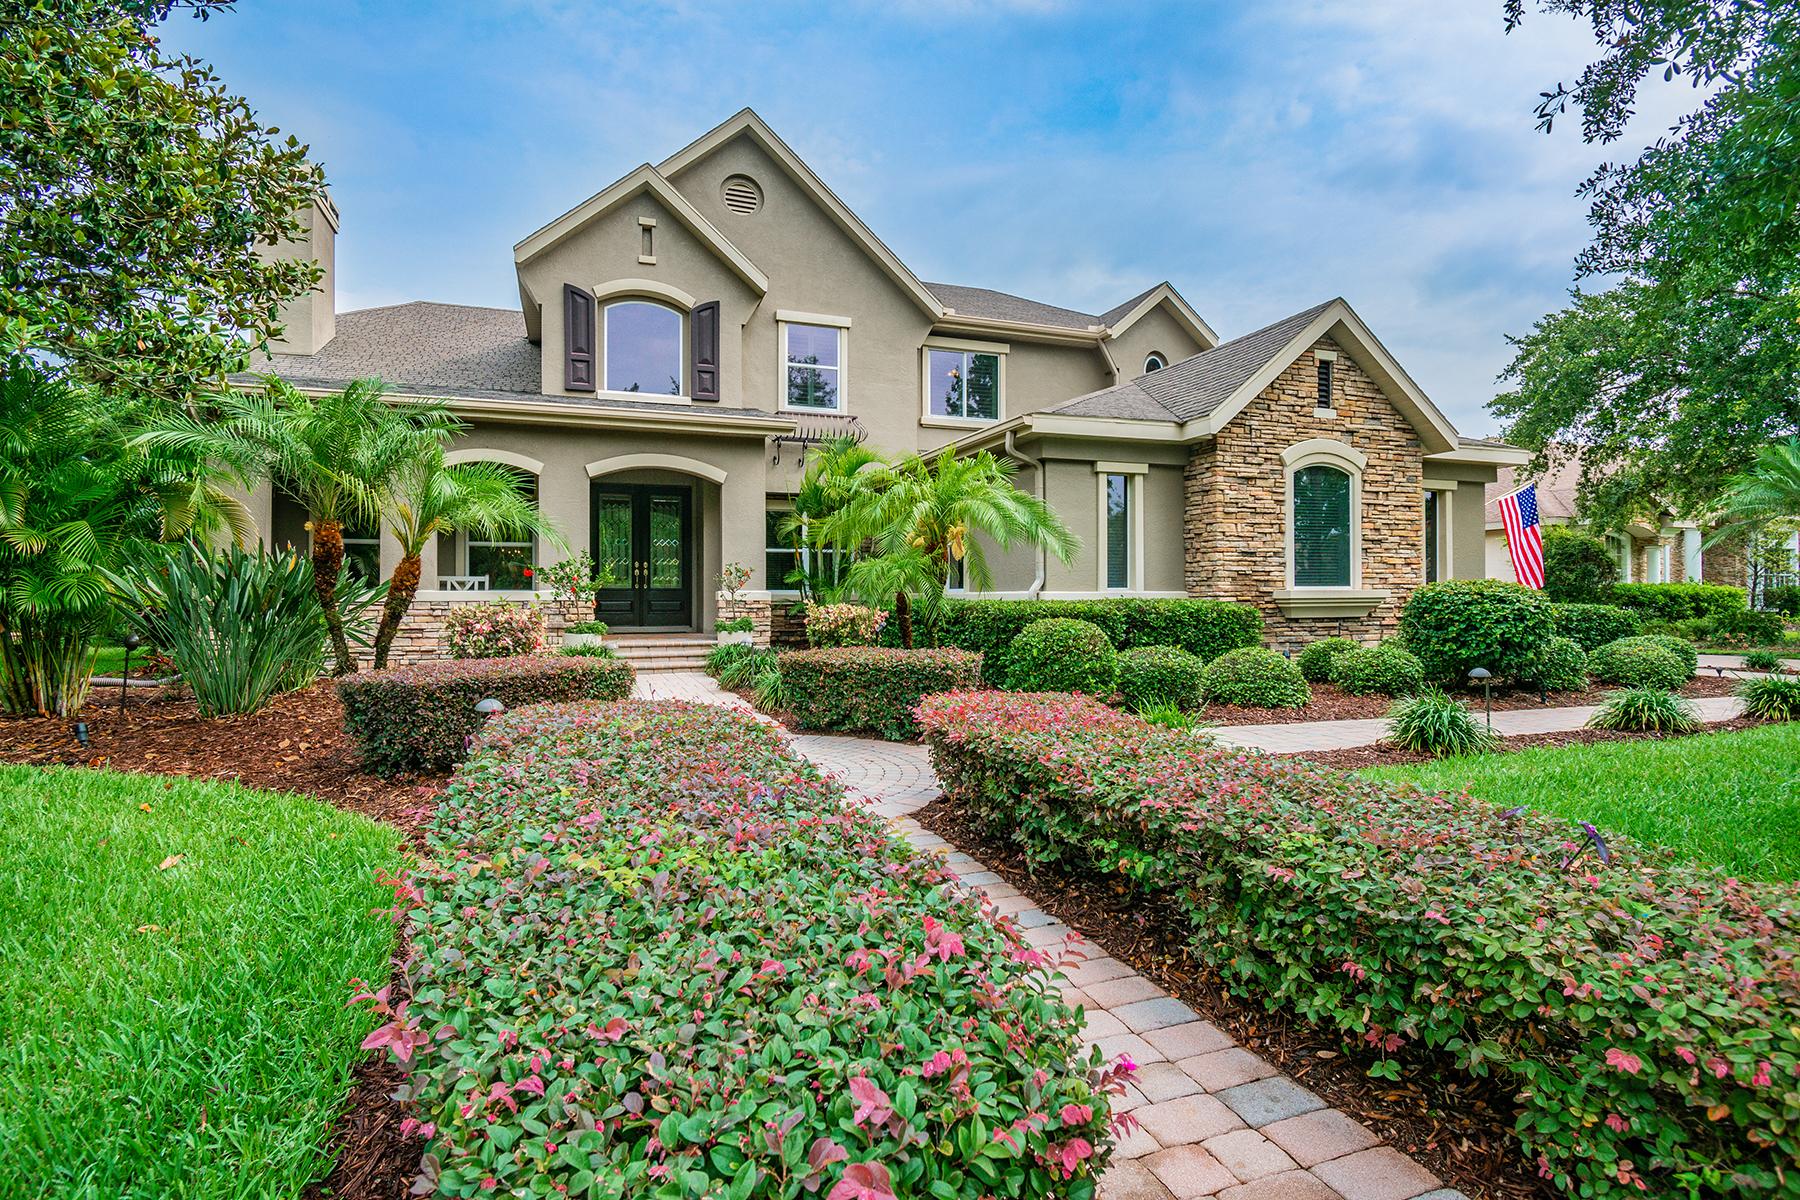 Single Family Homes için Satış at FISH HAWK TRAILS 6016 Flatwoods Manor Cir, Lithia, Florida 33547 Amerika Birleşik Devletleri